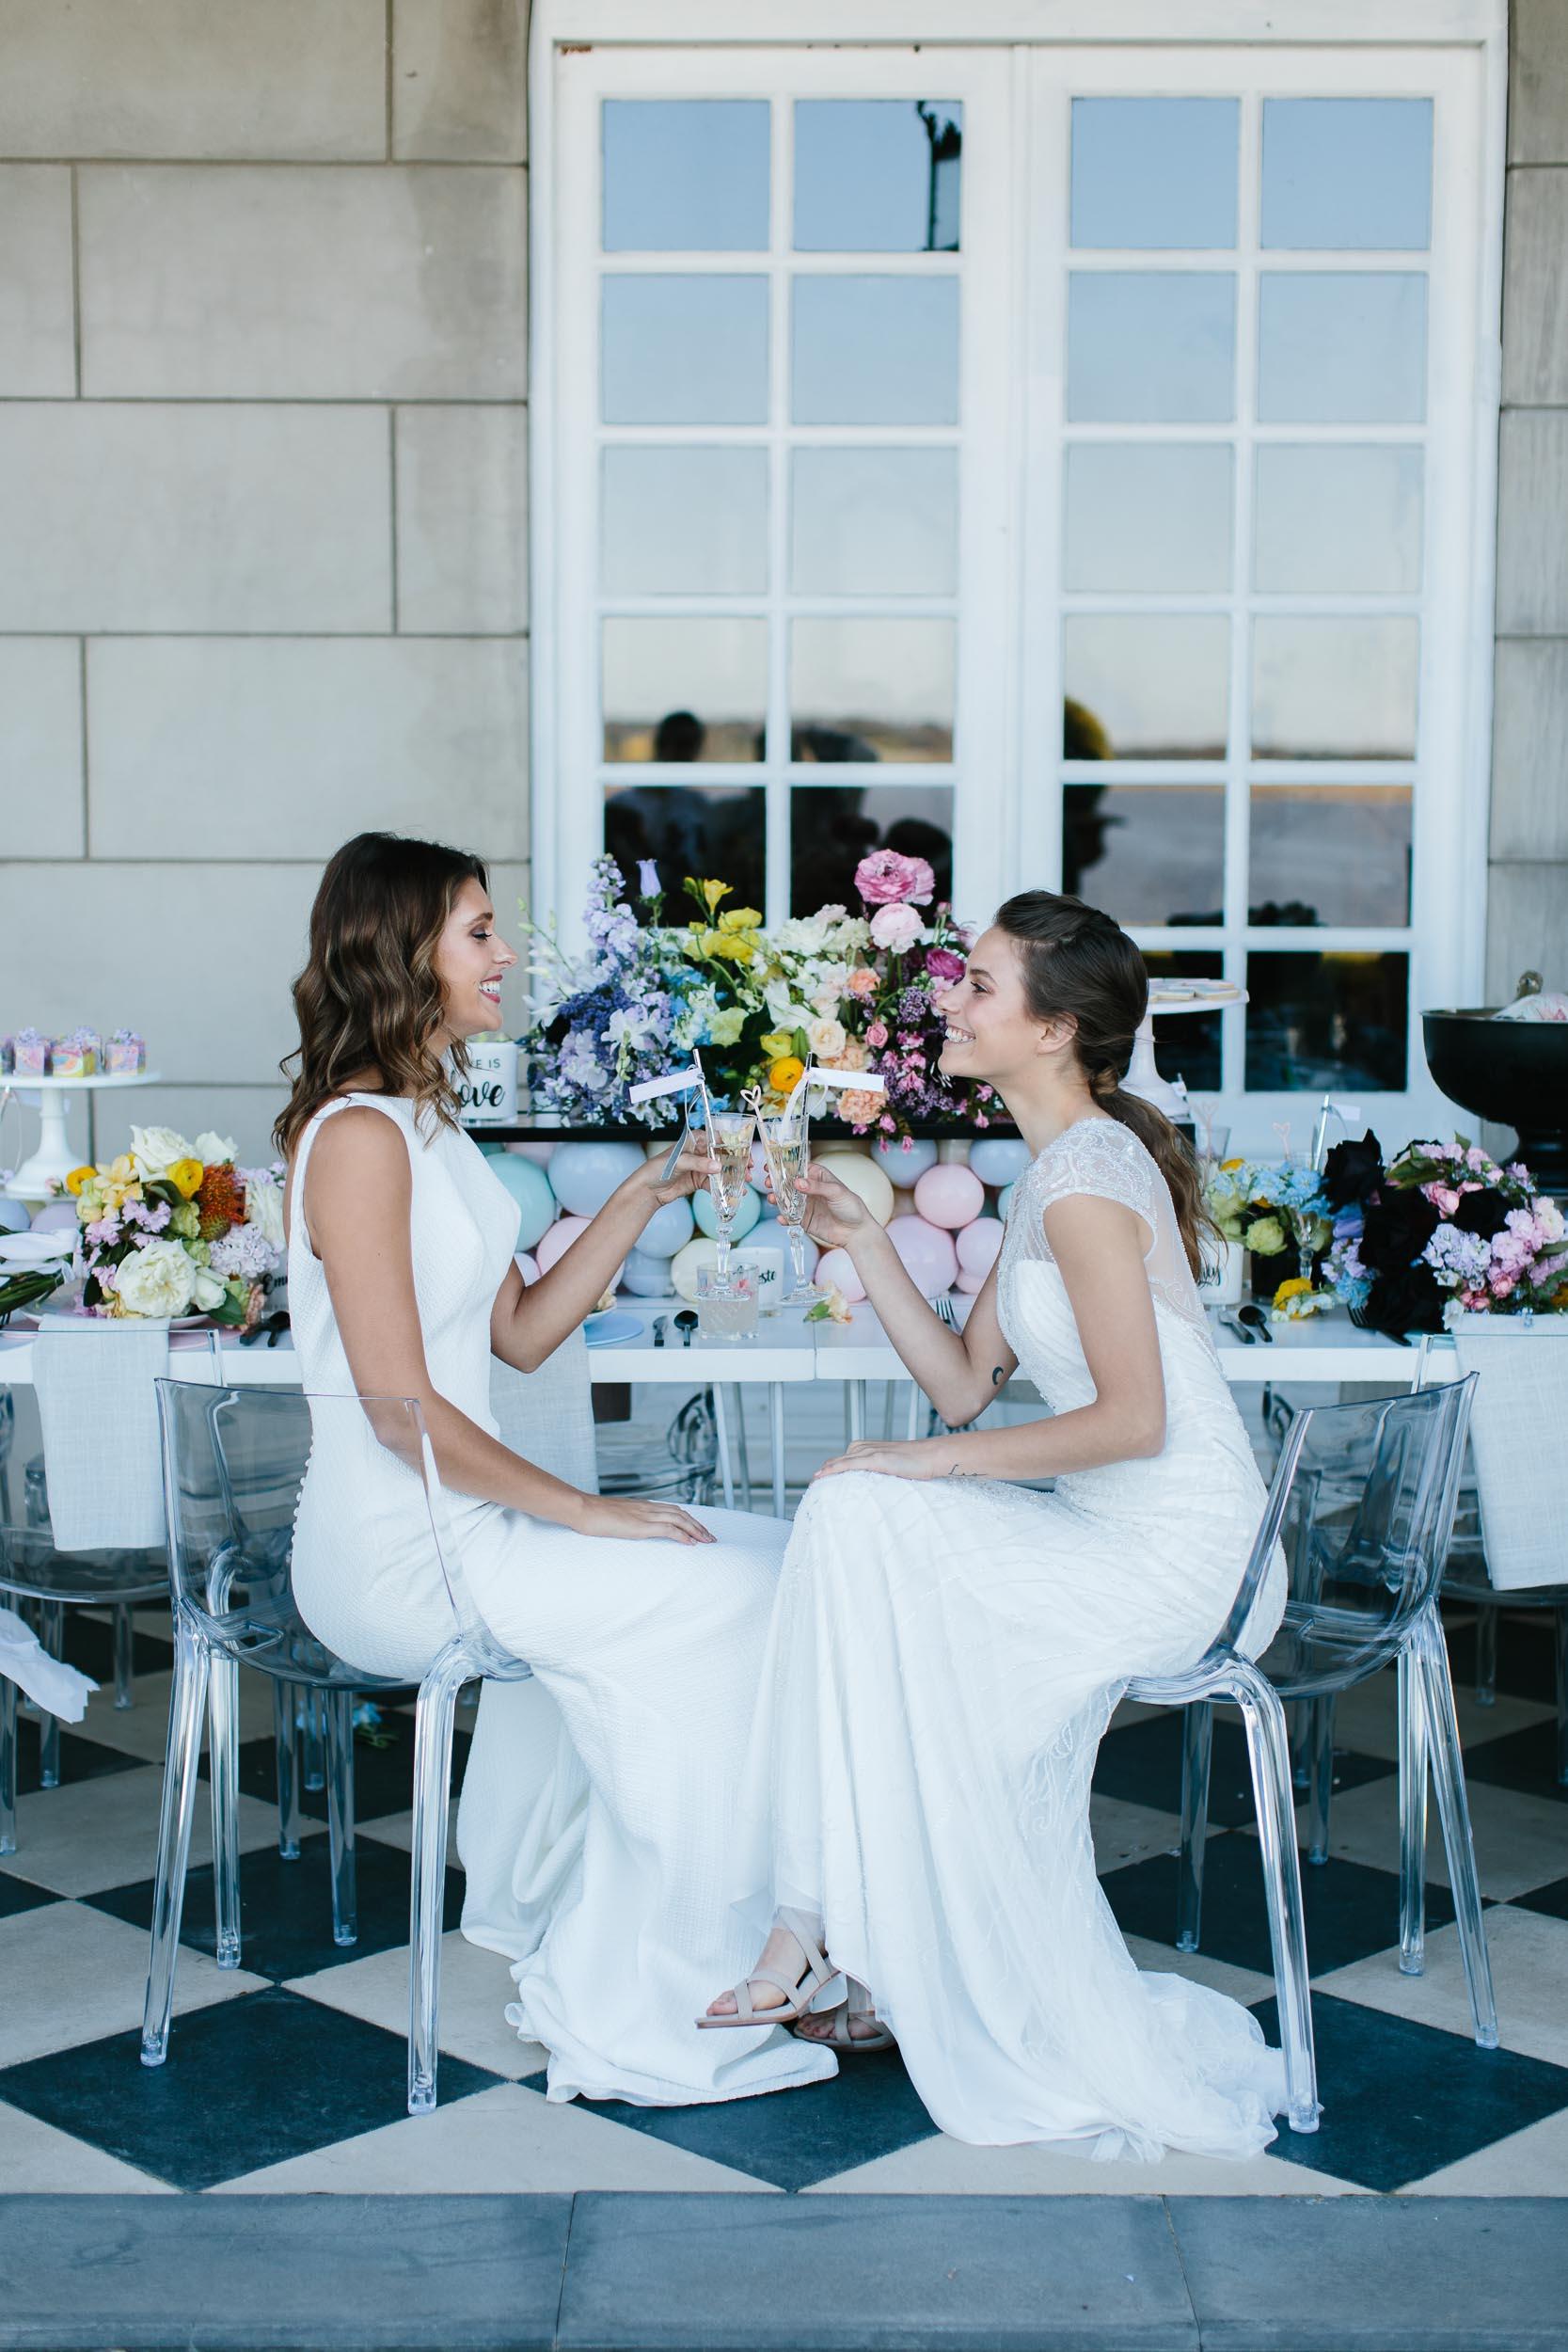 Same Sex Wedding Reception Photo | Wedding Photography by Kas Richards